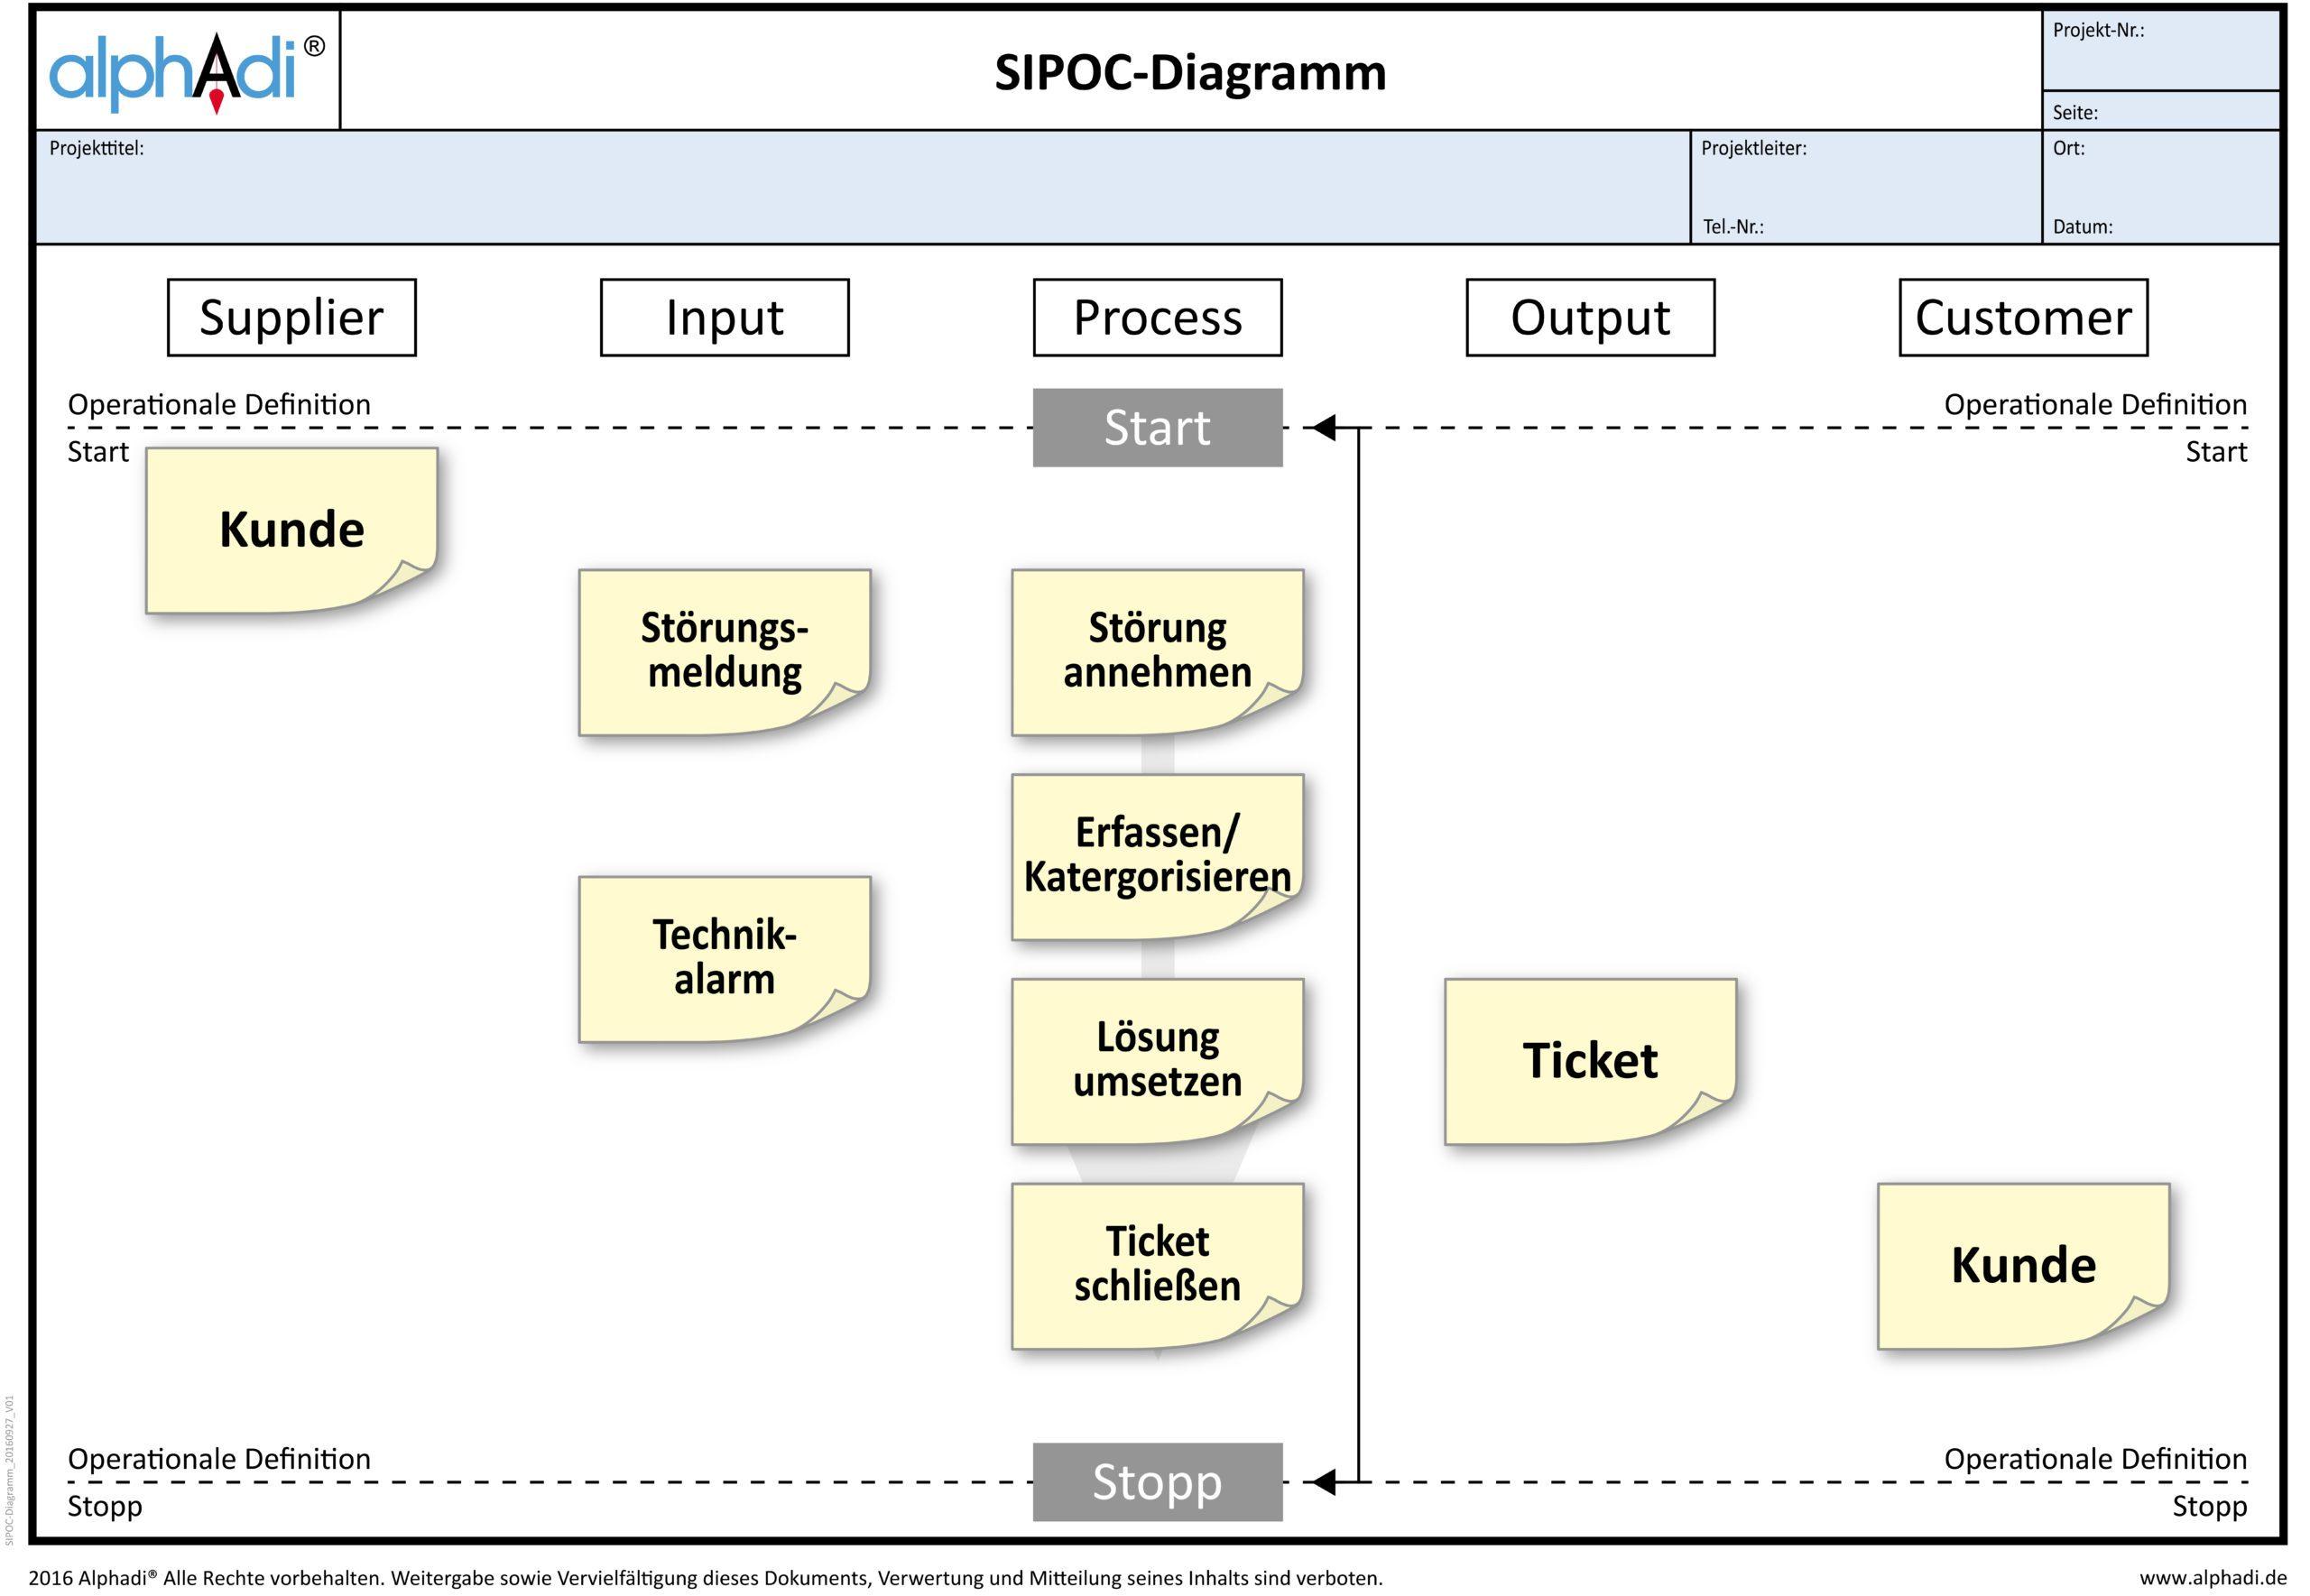 Define Phase SIPOC Diagramm